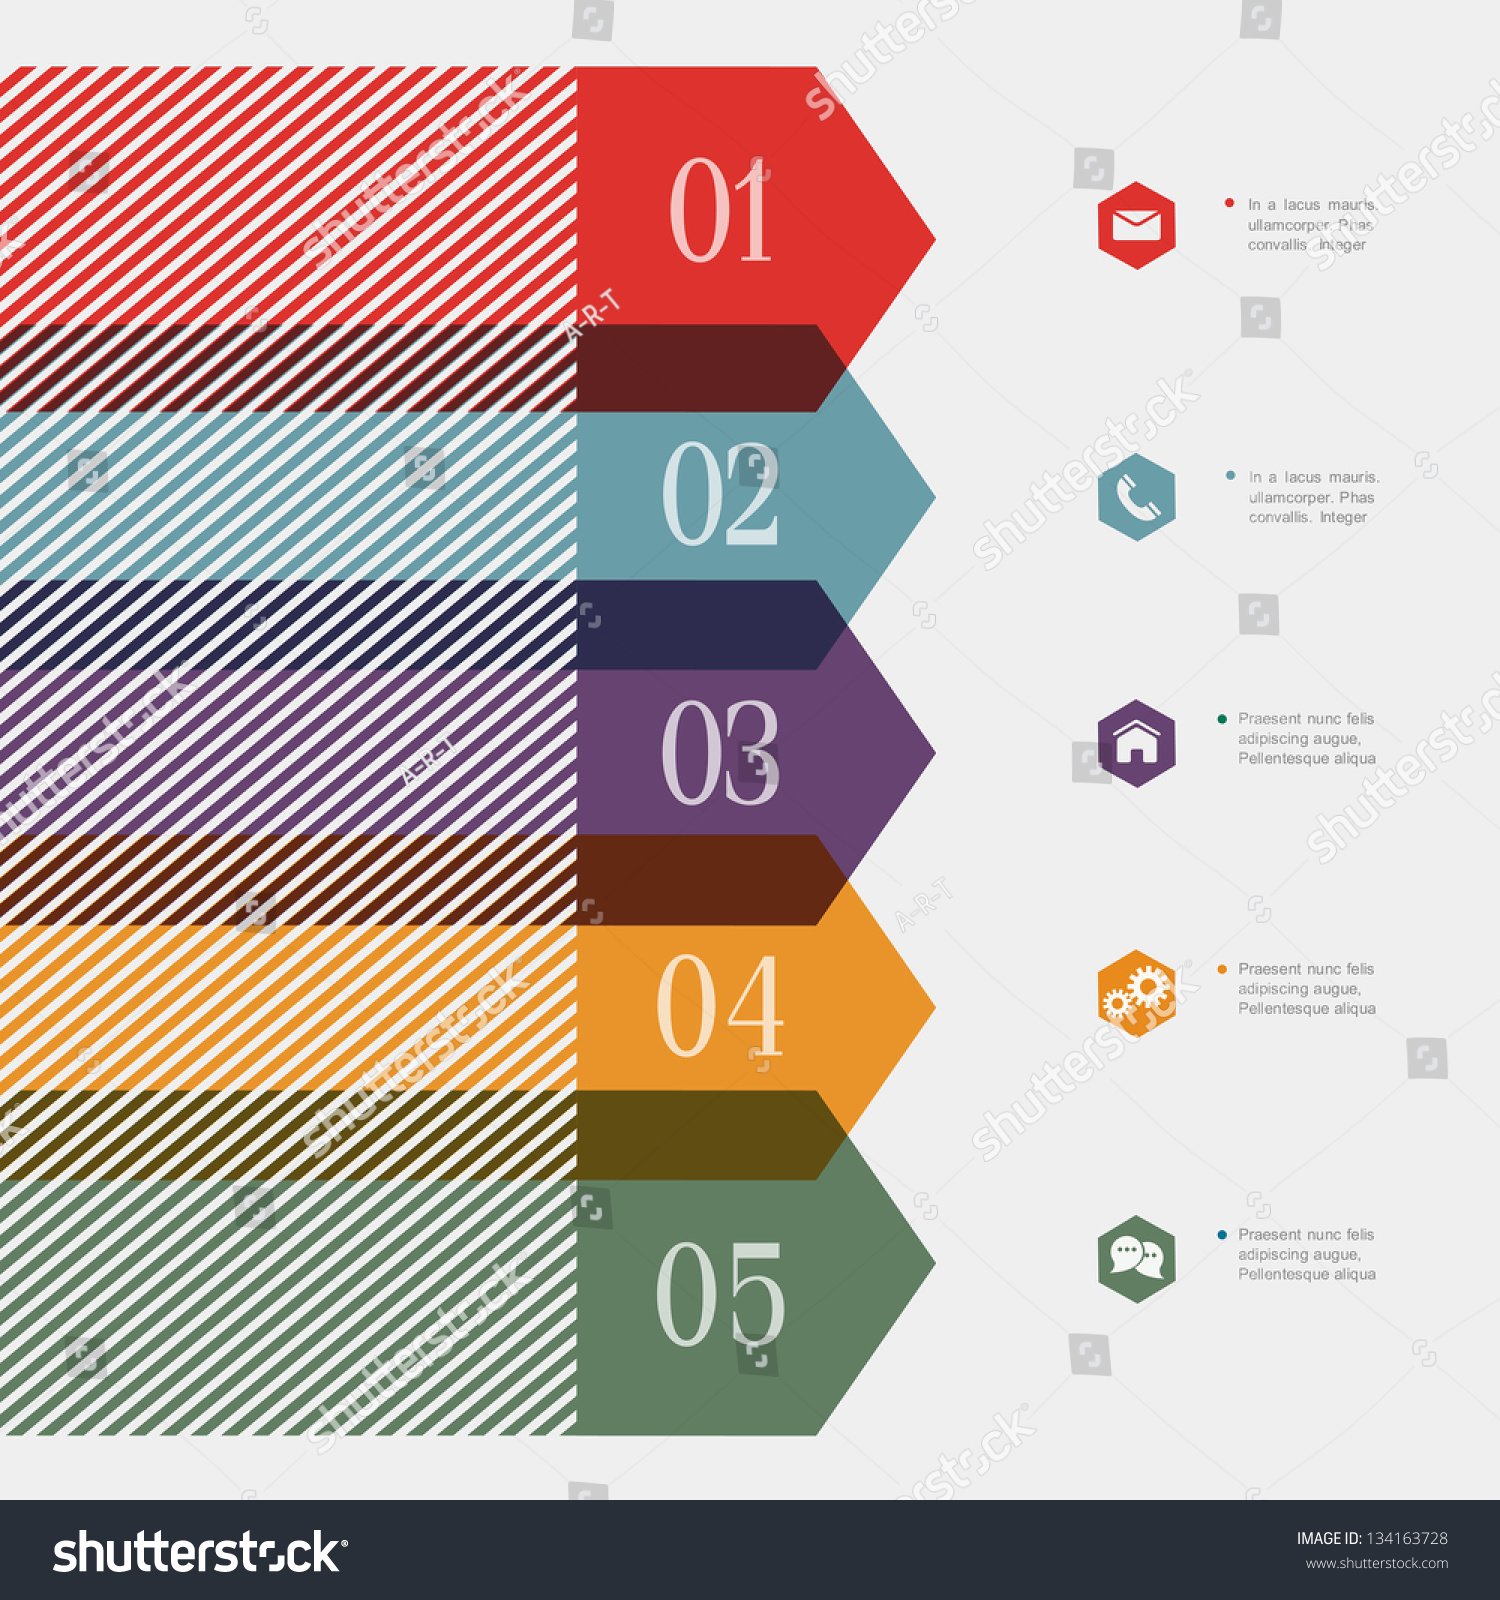 creative bannerarrow design infographicswebsite templates design creative banner arrow design for infographics website templates or design graphic for business